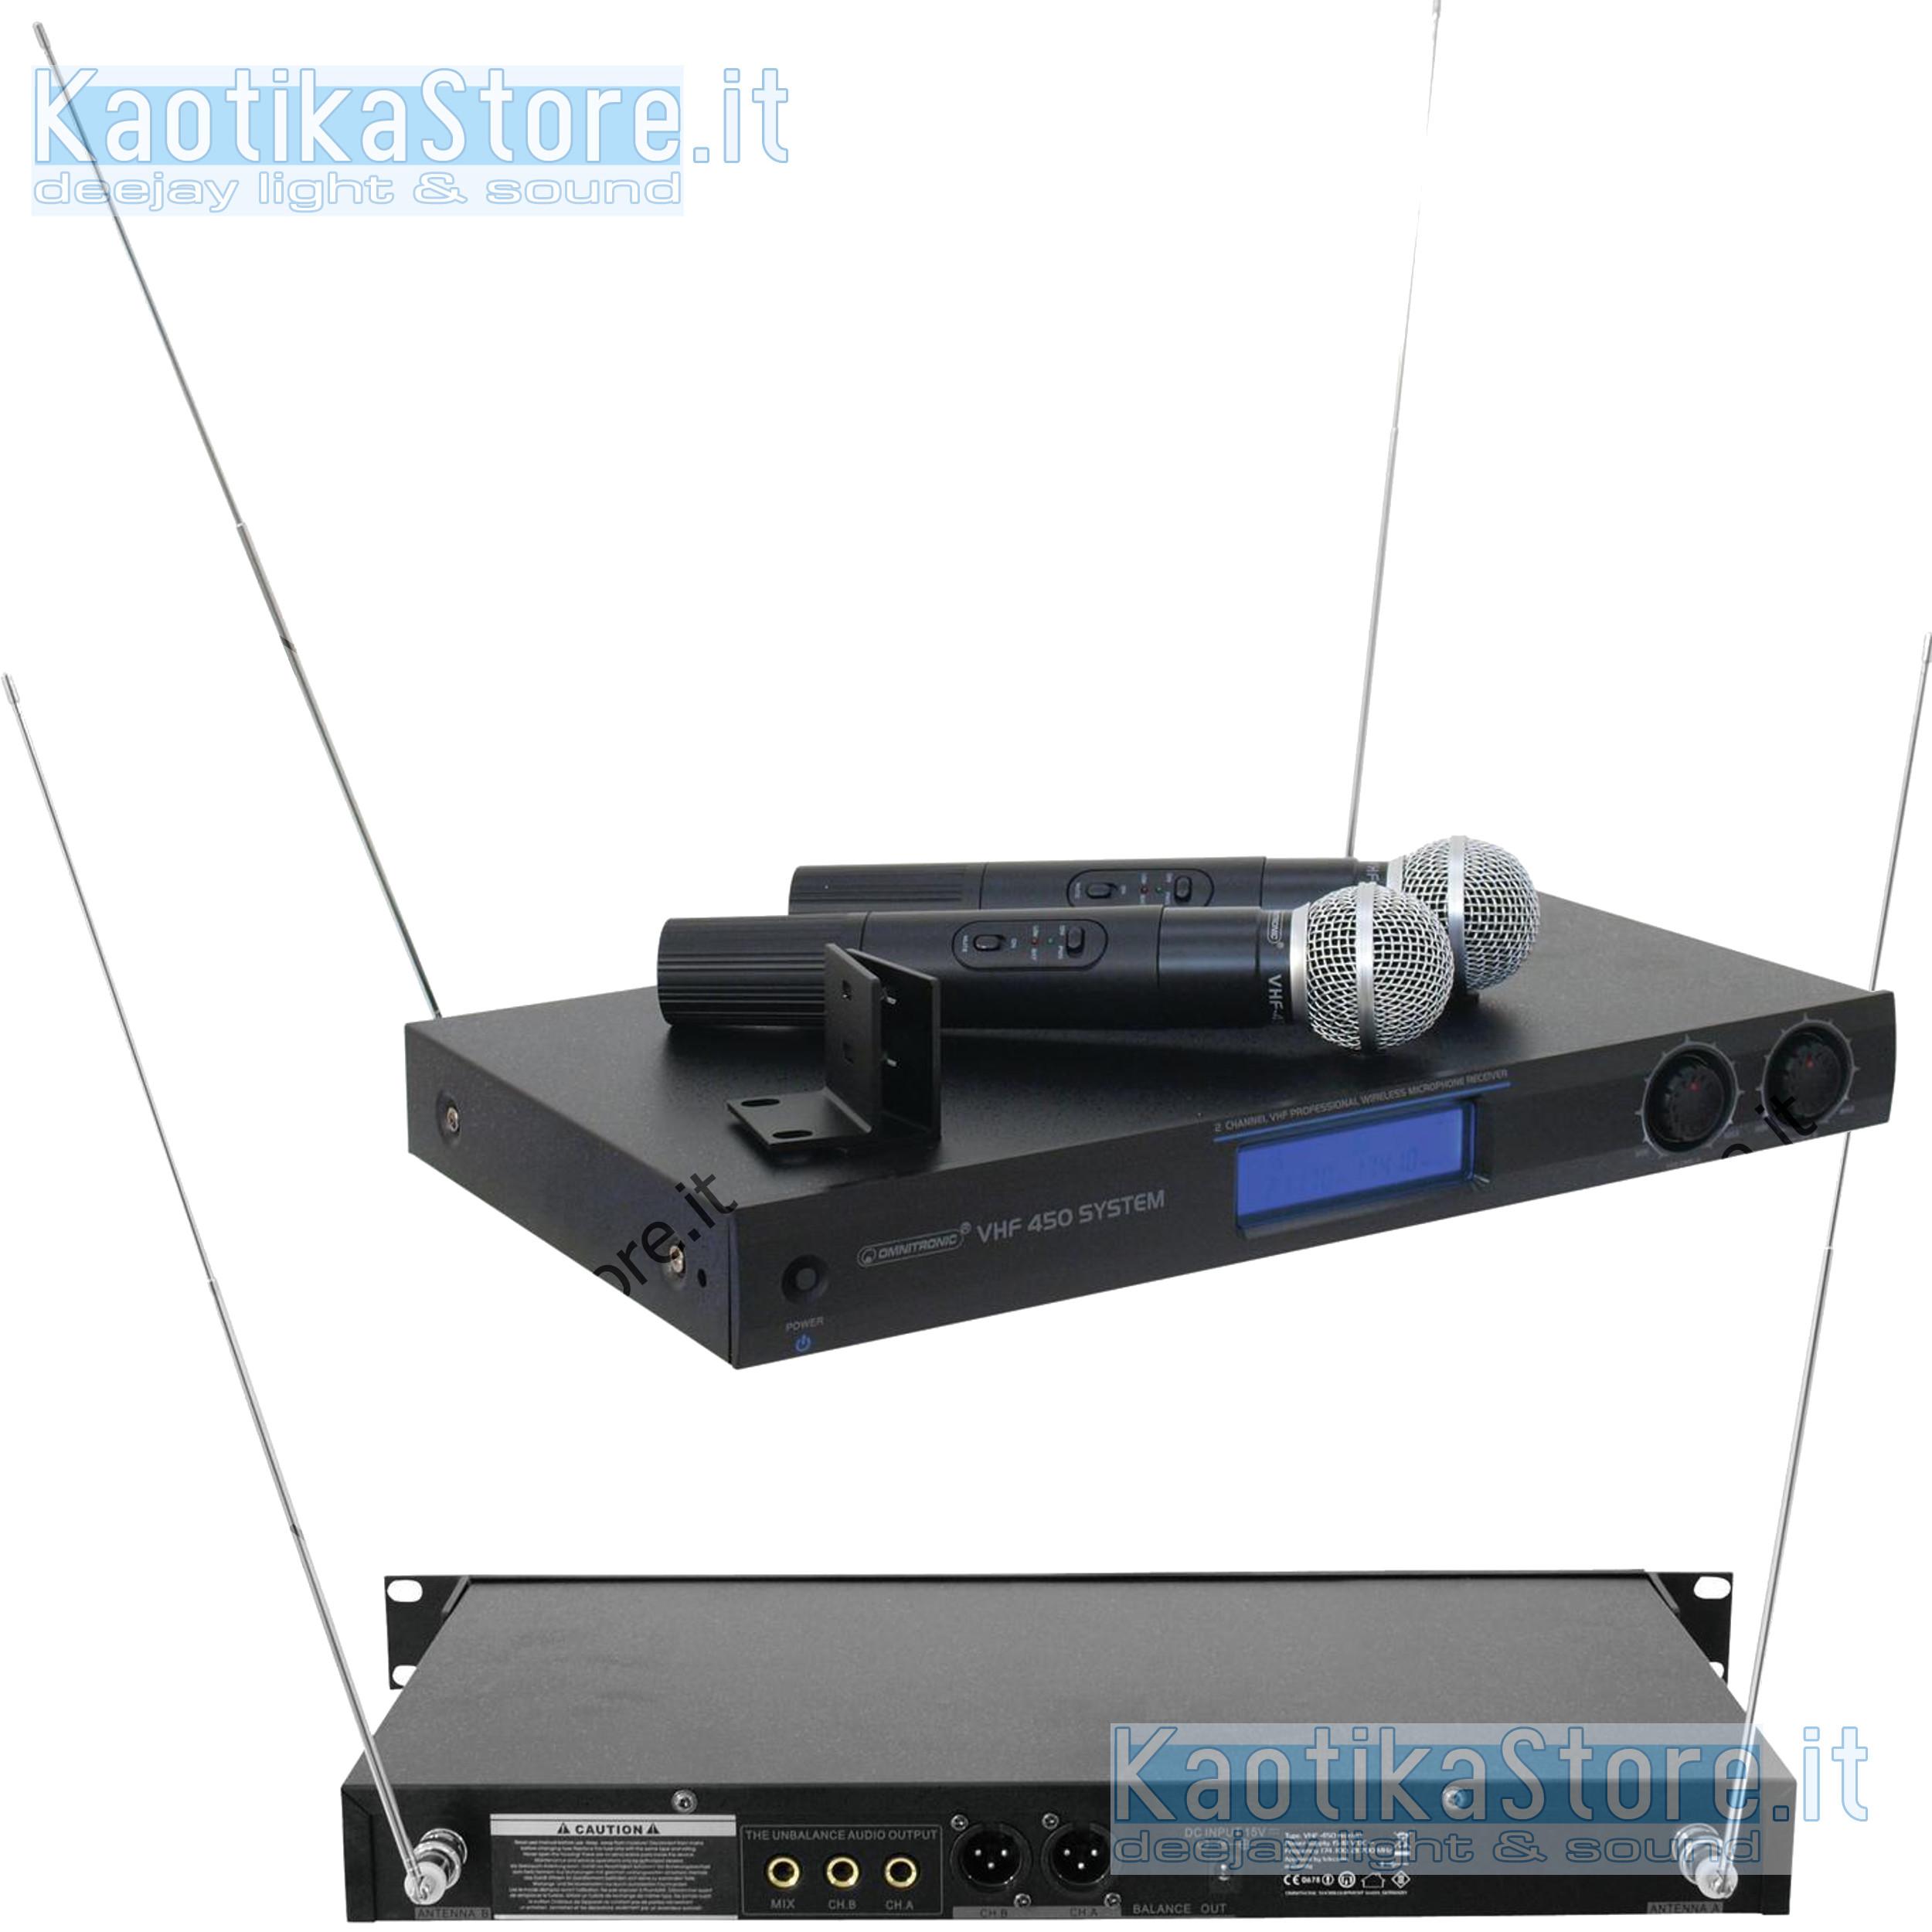 Microfono senza fili omnitronic vhf 450 doppio x karaoke piano bar kaotikastore ebay - Specchi riflessi karaoke ...